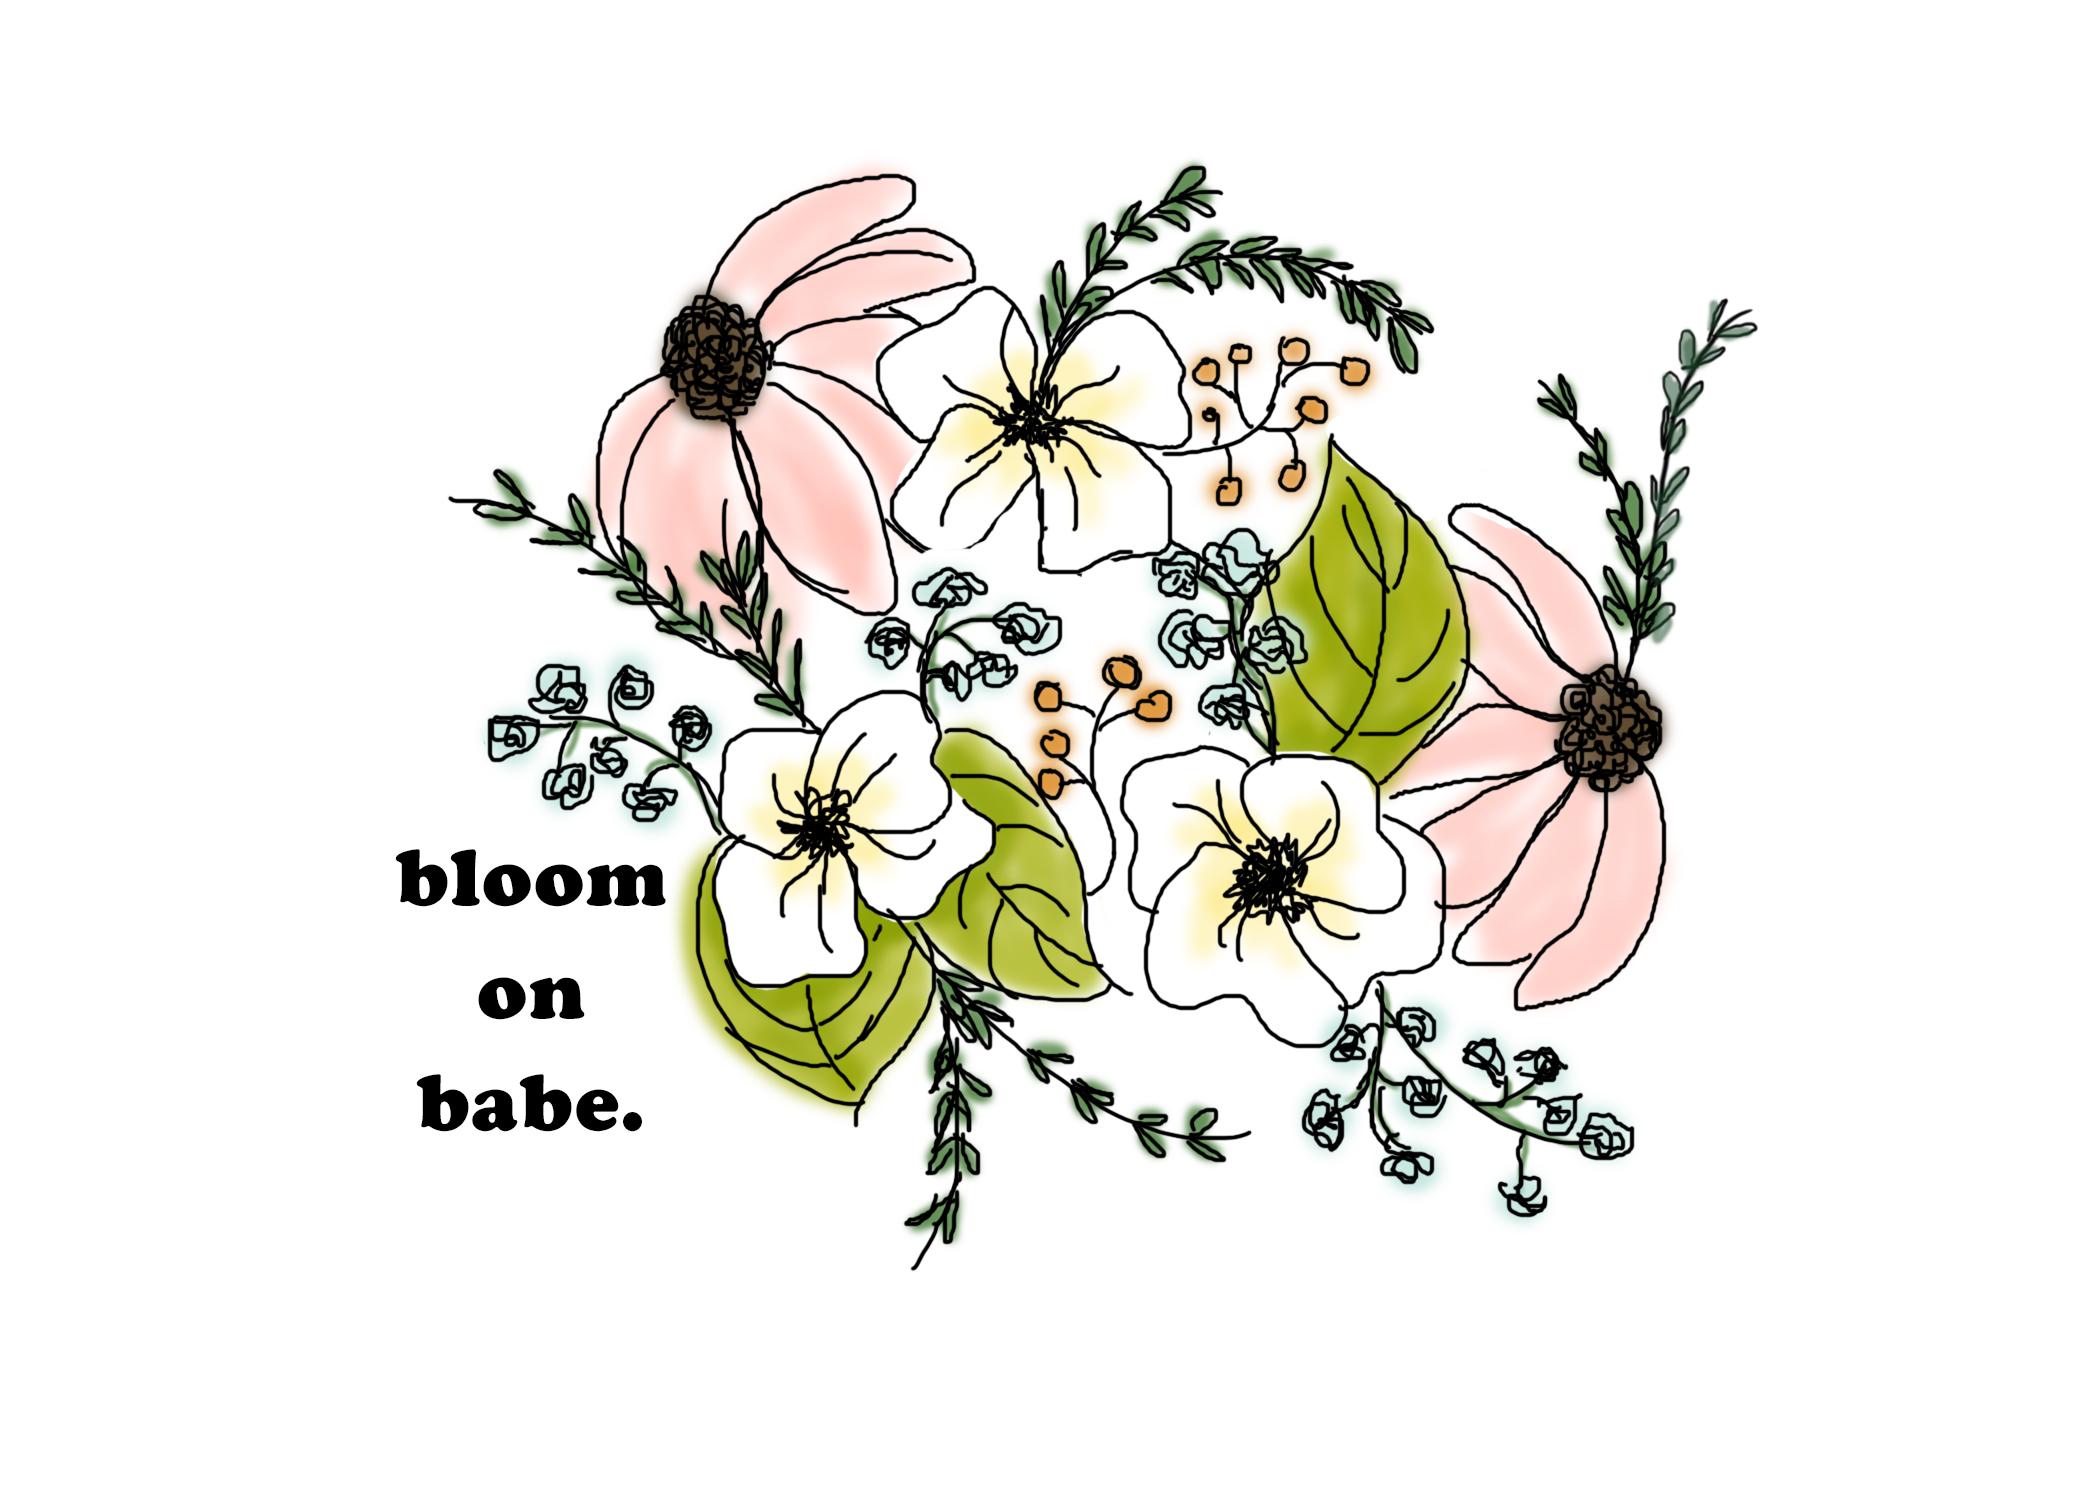 bloom on babe.jpg